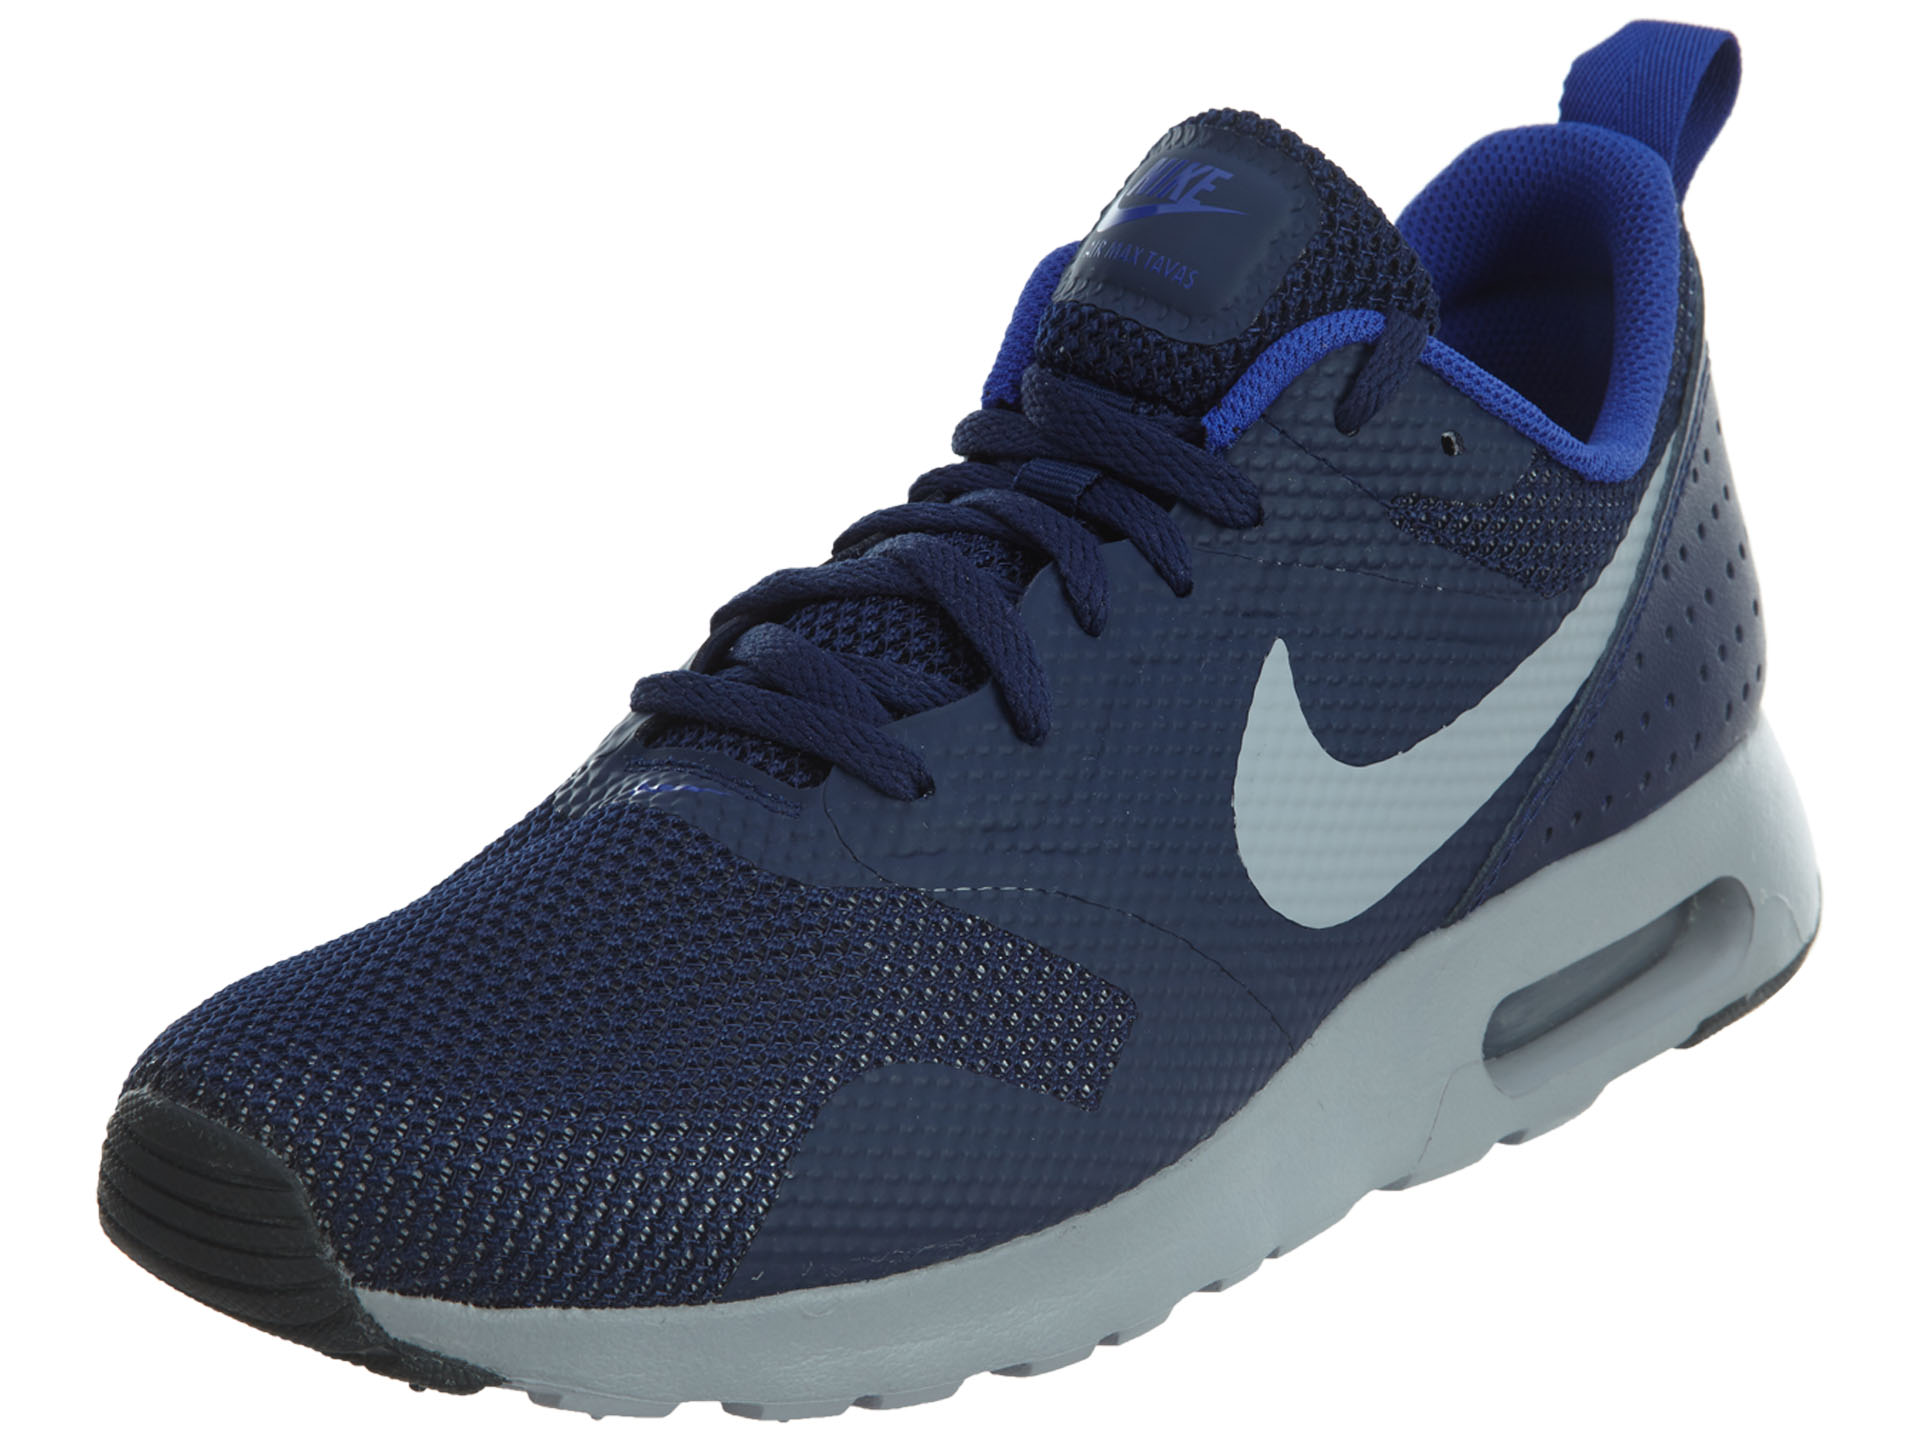 Nike Air Max Tavas Mens Style : 705149